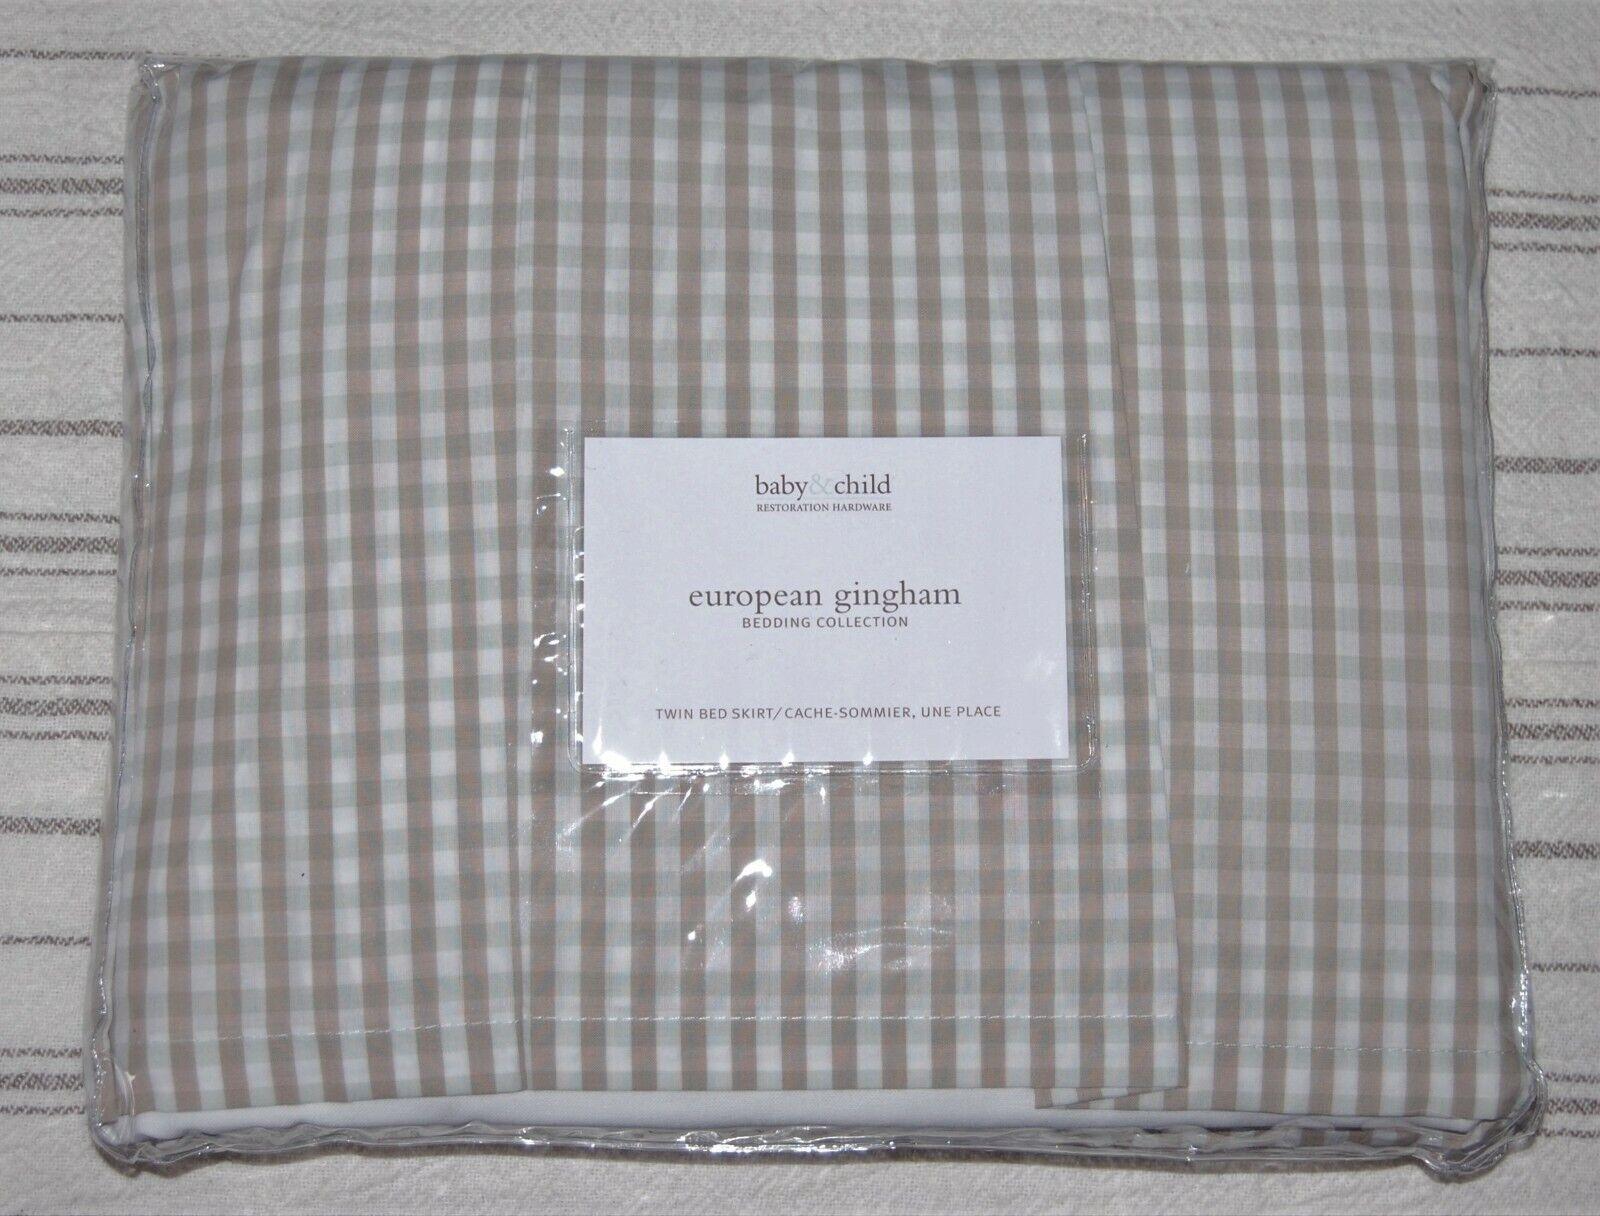 New Restoration Hardware Baby Child Twin Bed Skirt European Gingham For Sale Online